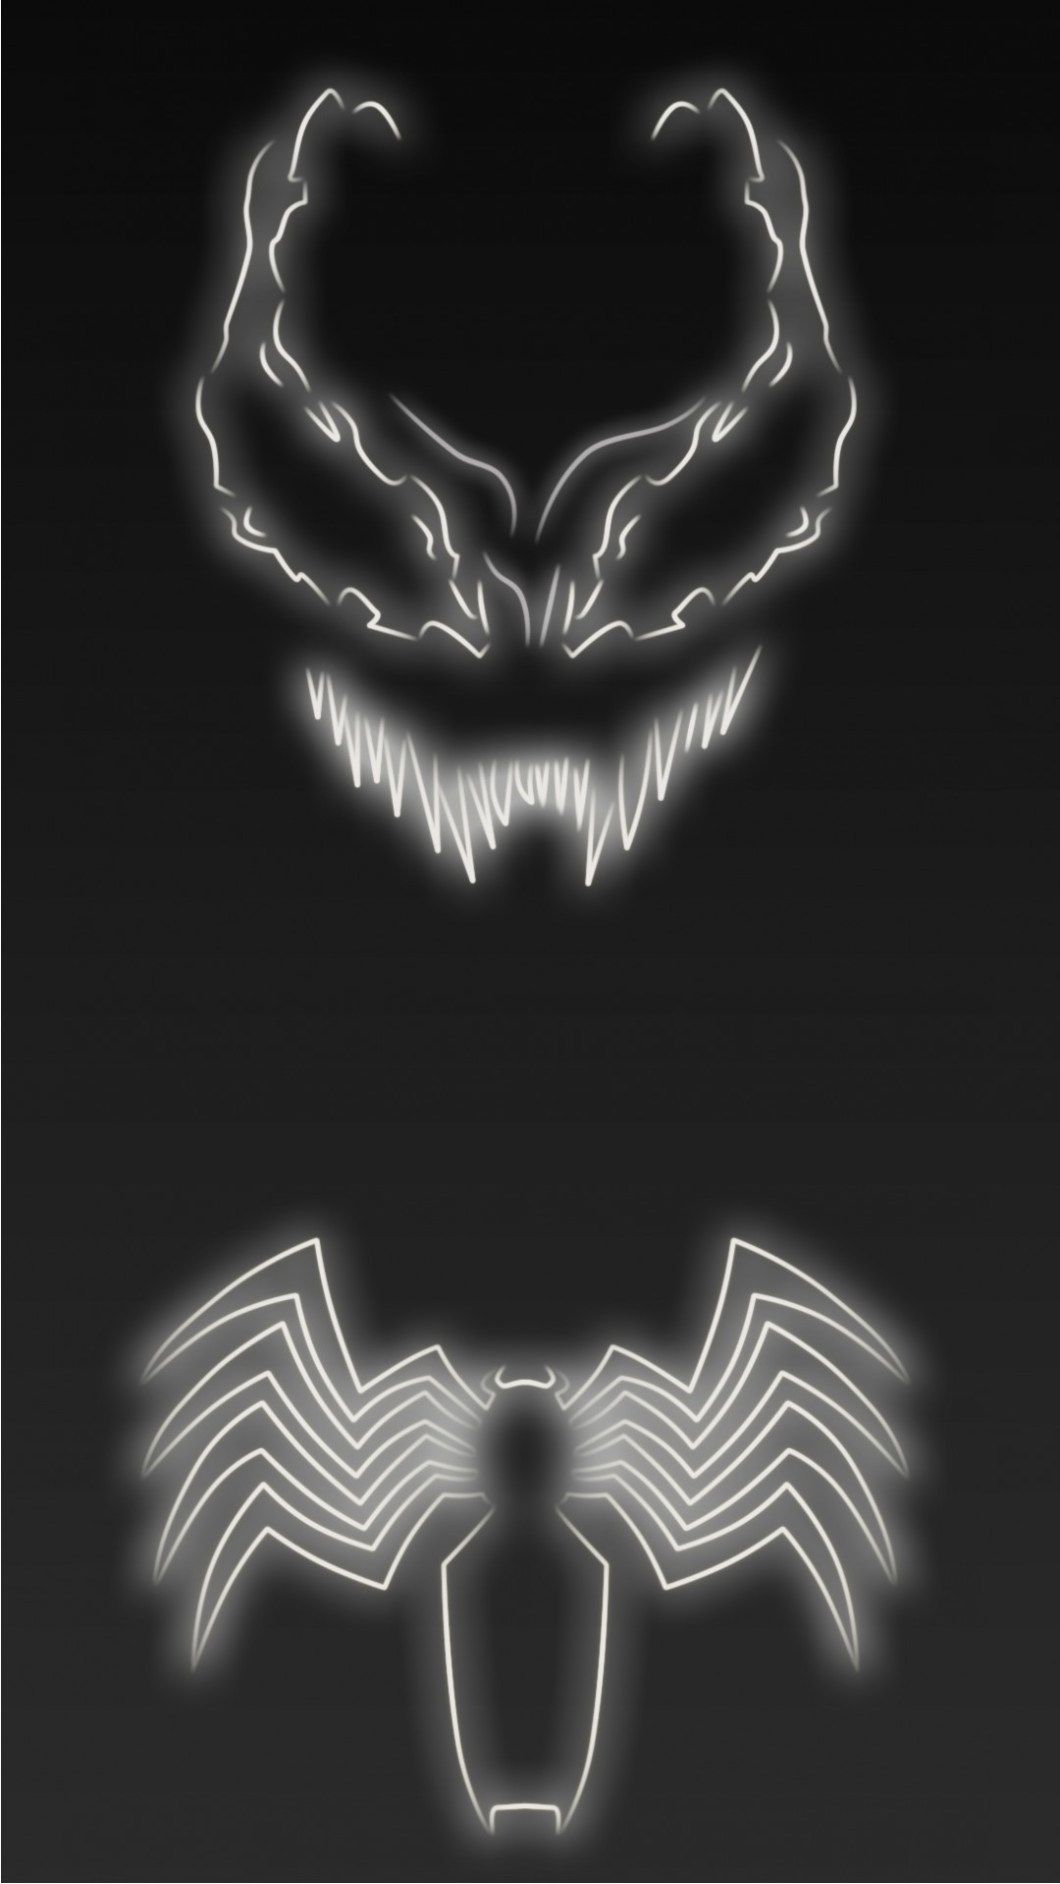 Anti Venom Phone Wallpapers Top Free Anti Venom Phone Backgrounds